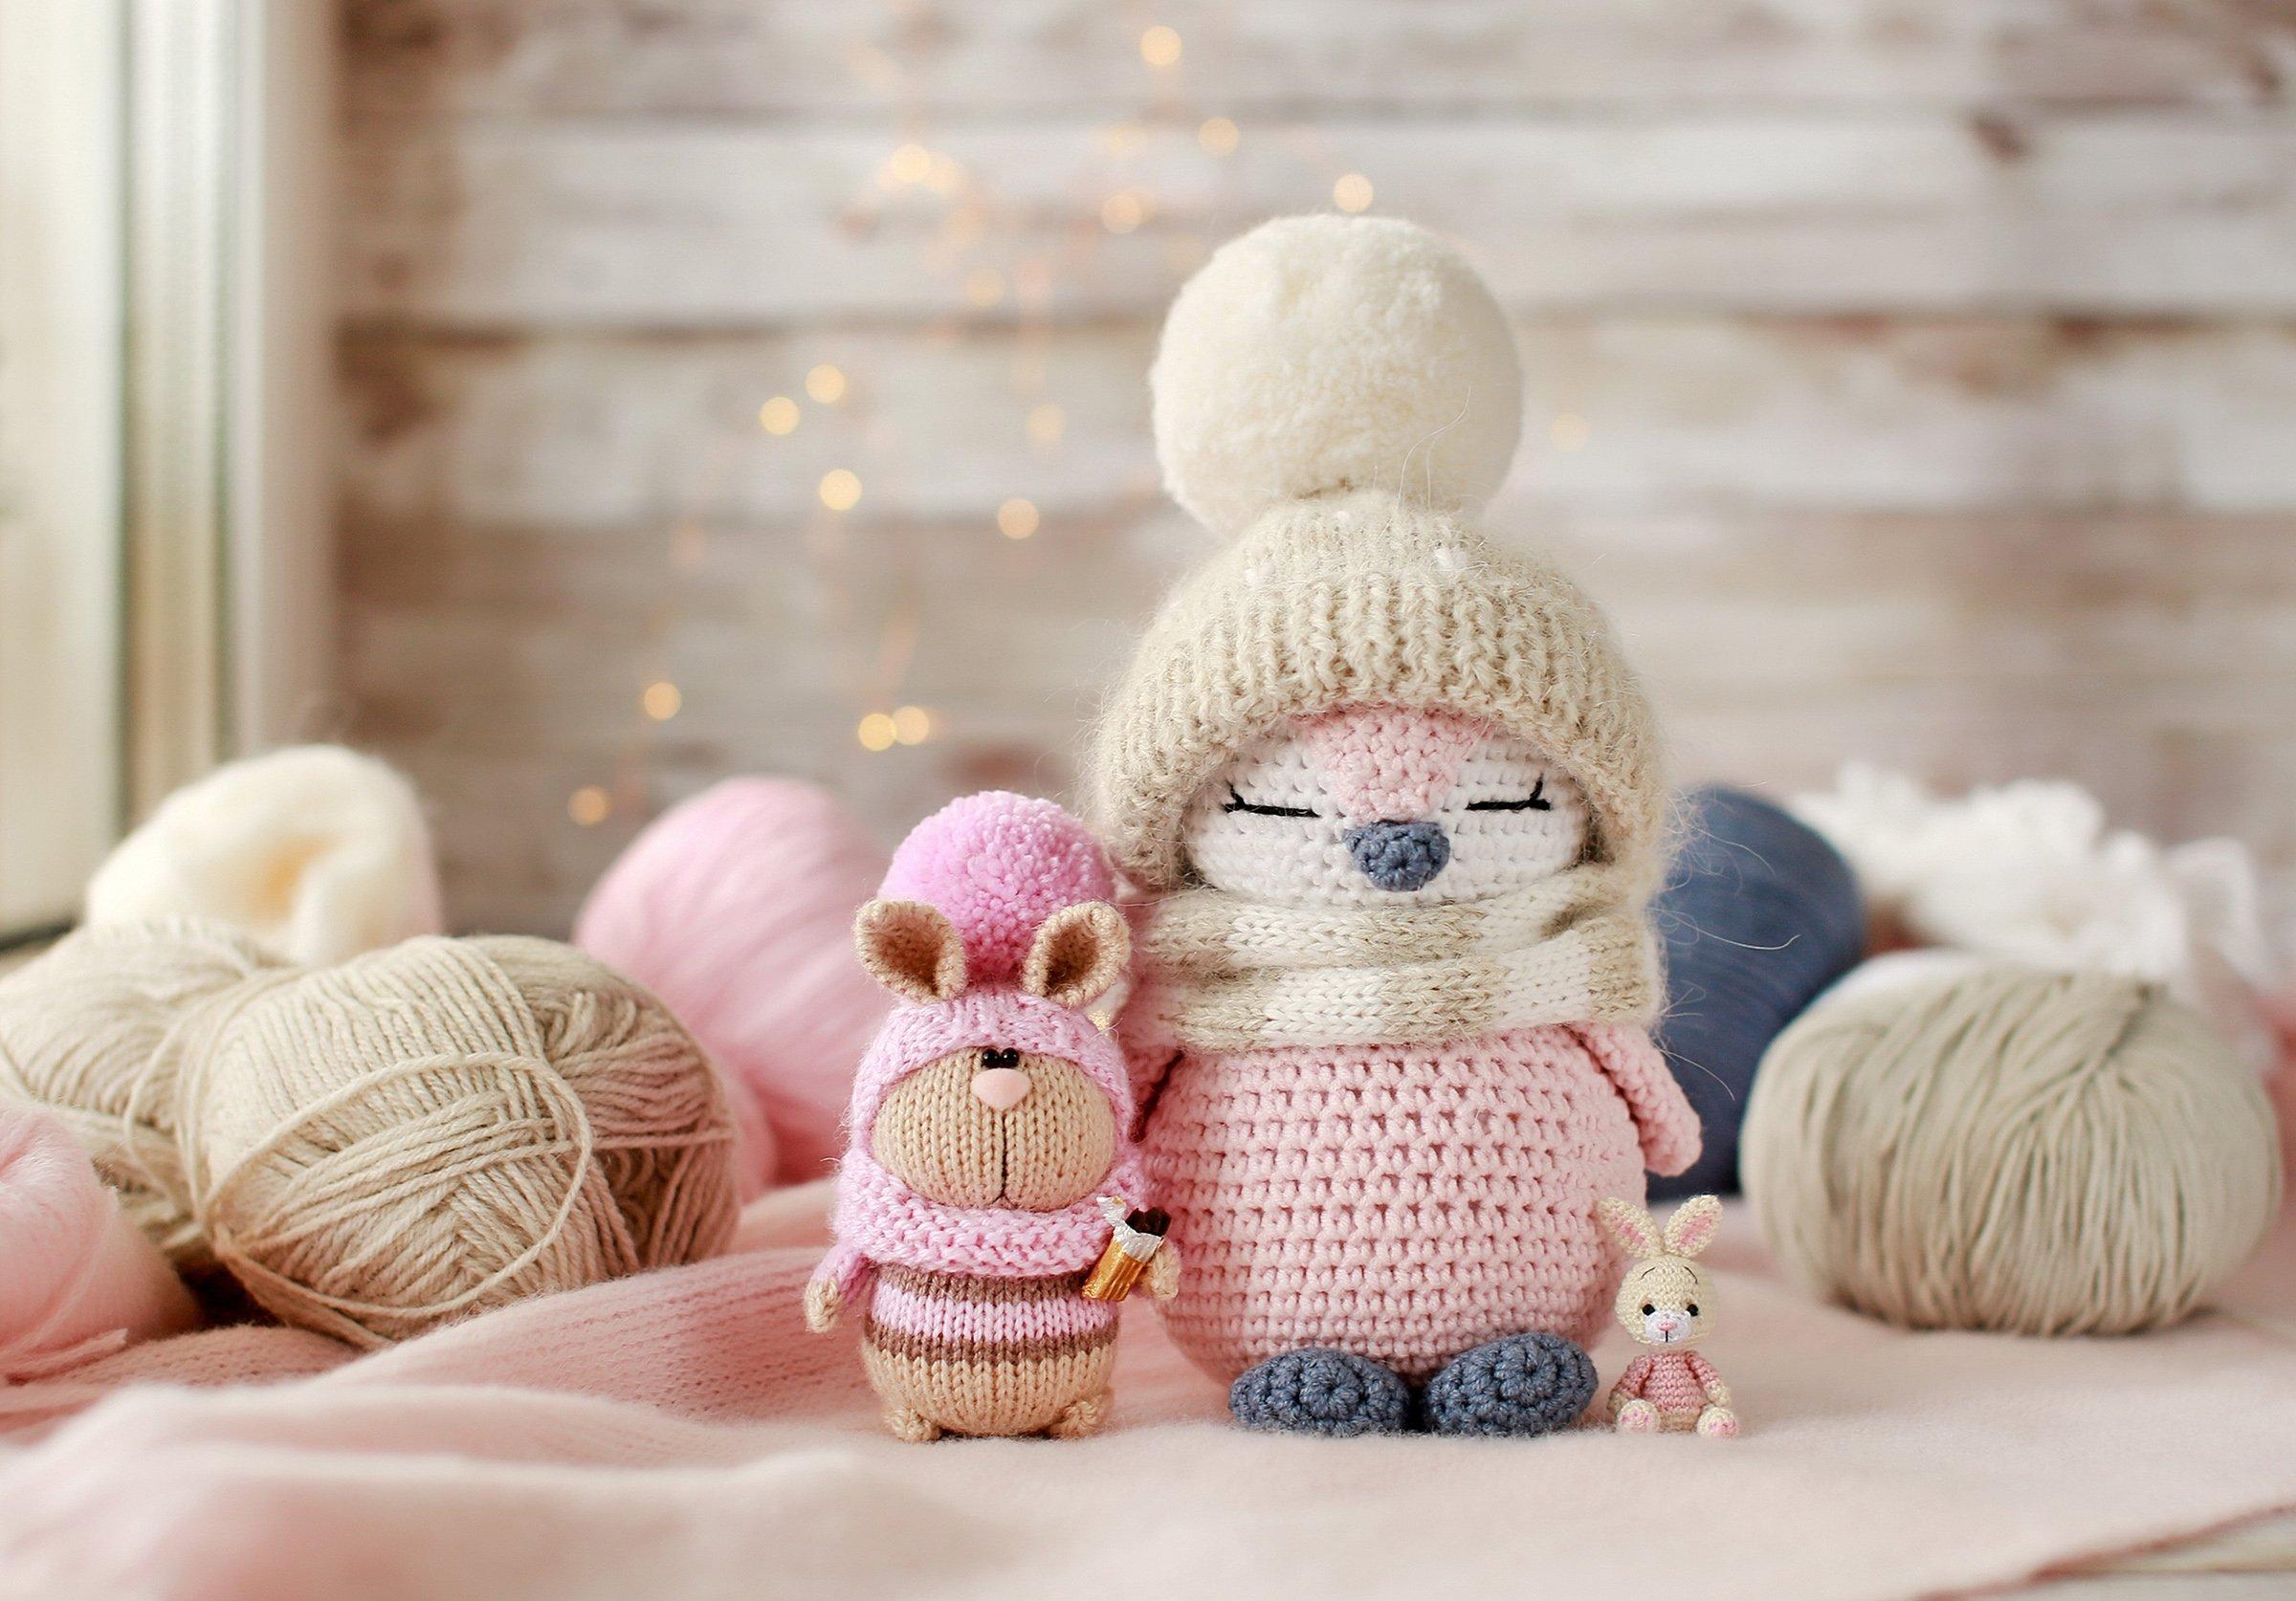 Amigurumi is the Japanese art of crocheting small, stuffed yarn creatures. (Shutterstock Photo)